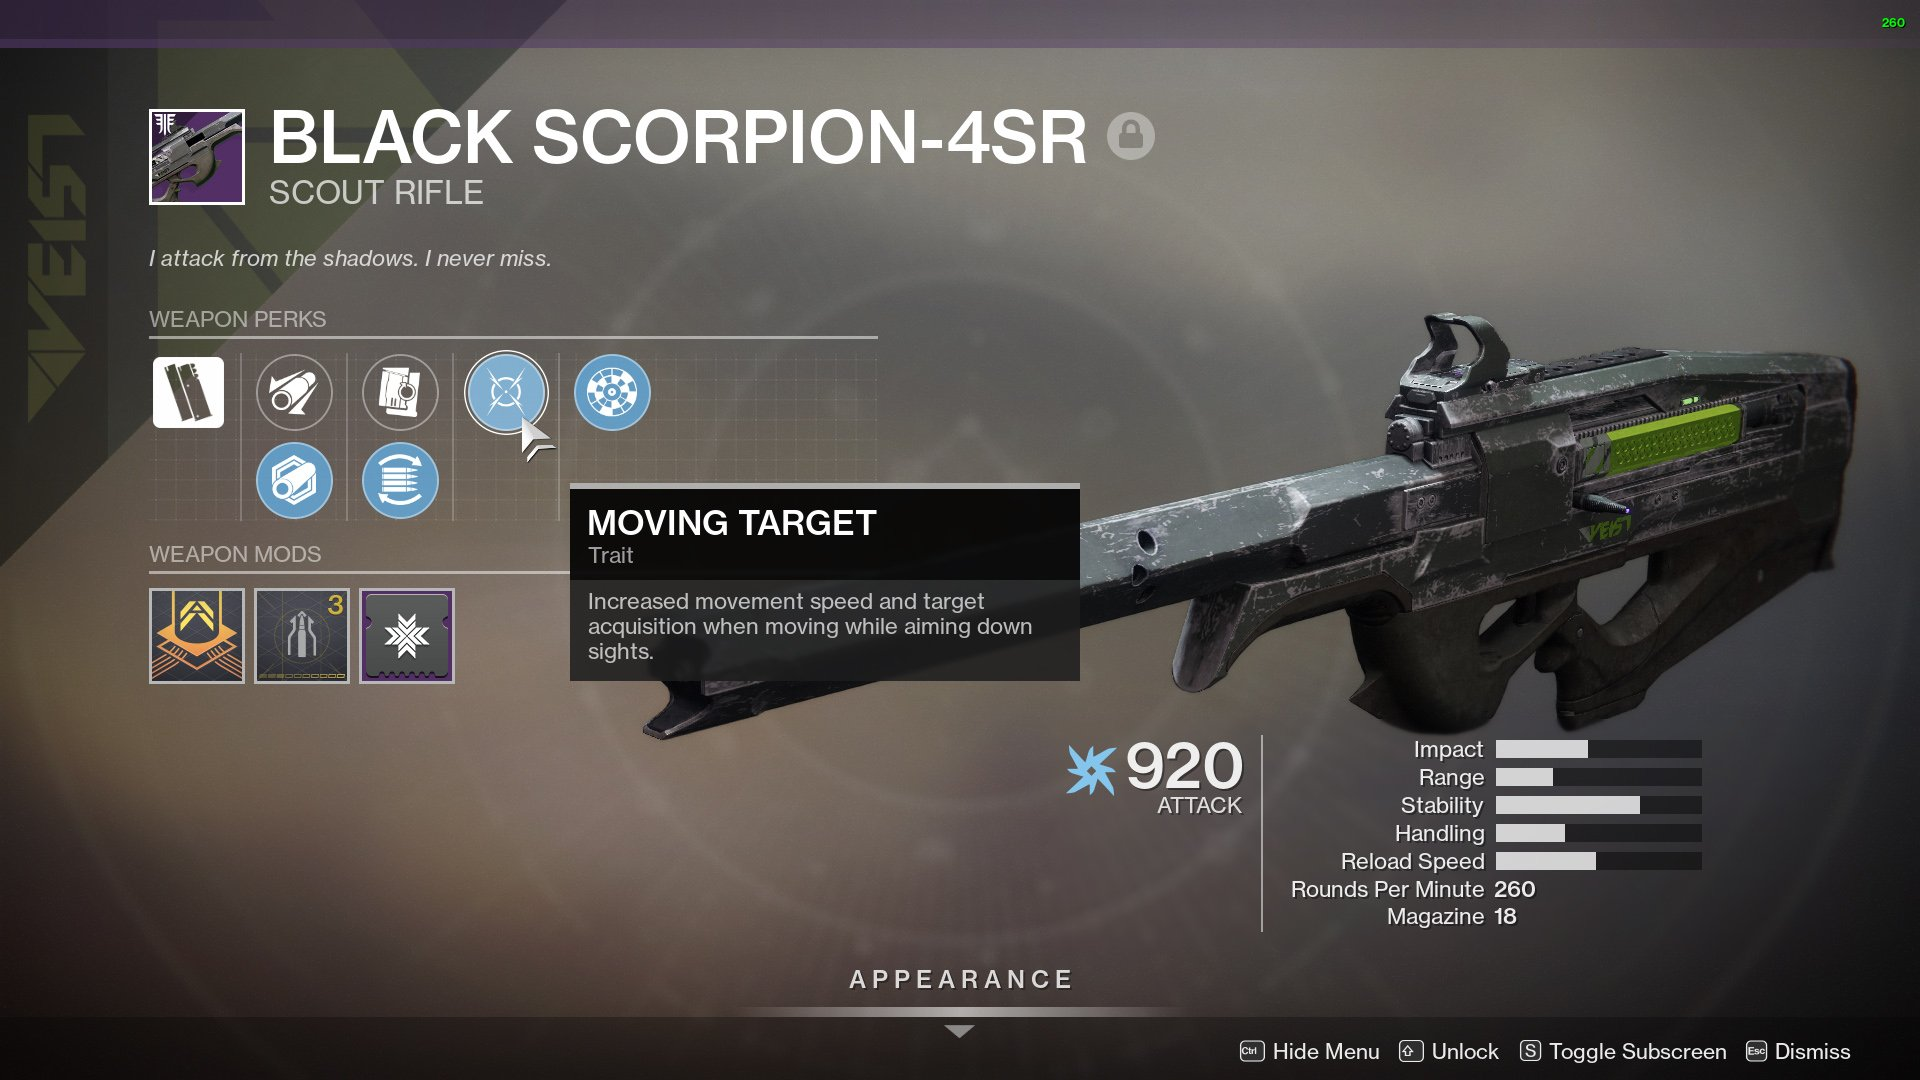 Destiny 2 Black Scorpion 4sr Scout Rifle